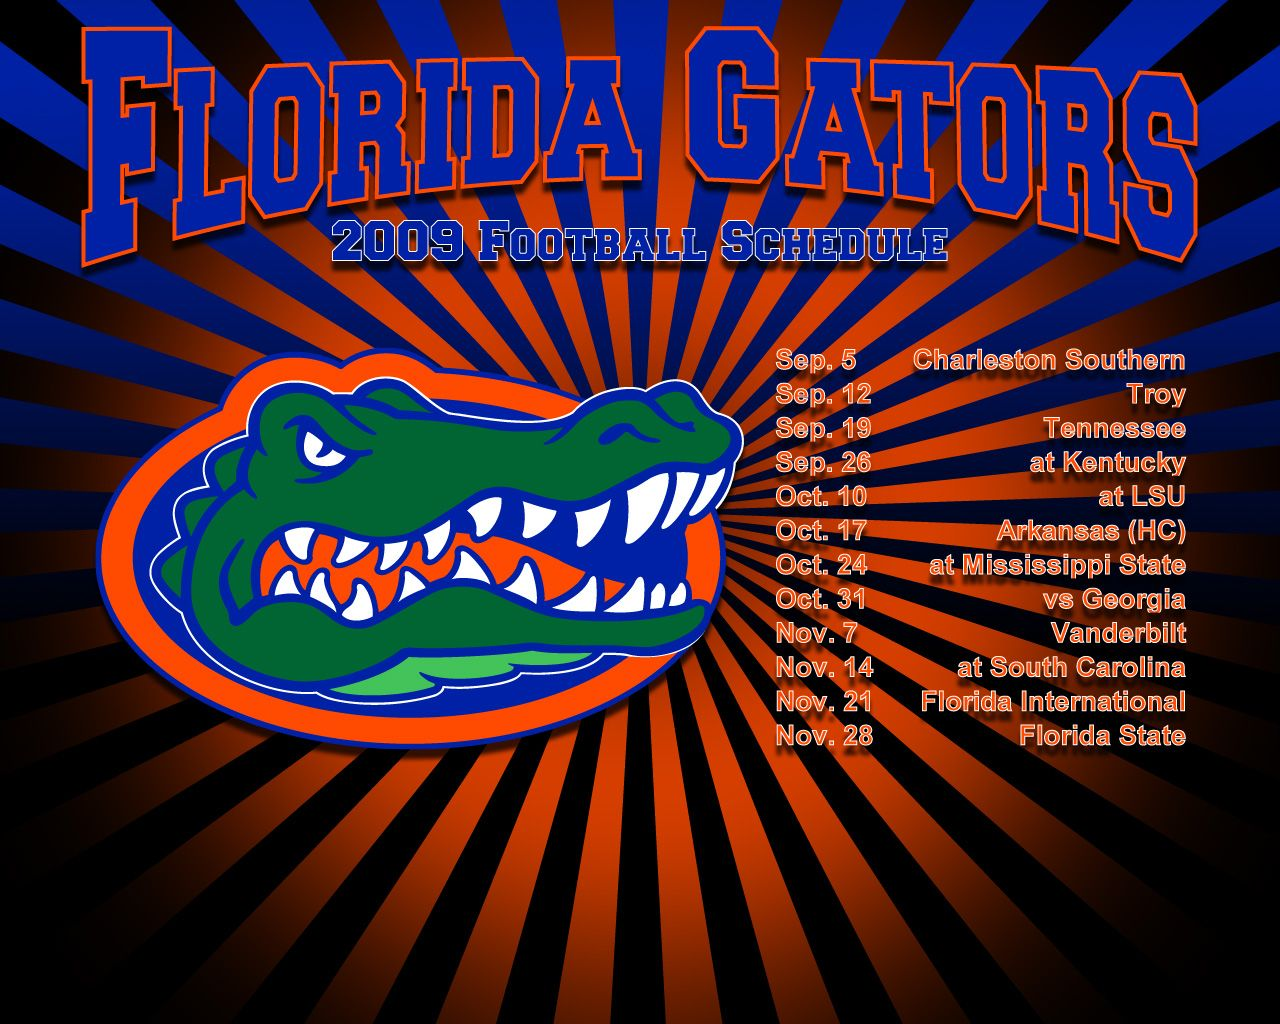 Florida Gator Background Pictures Florida Gators Wallpaper Florida Gators Wallpaper Florida Gators Gator